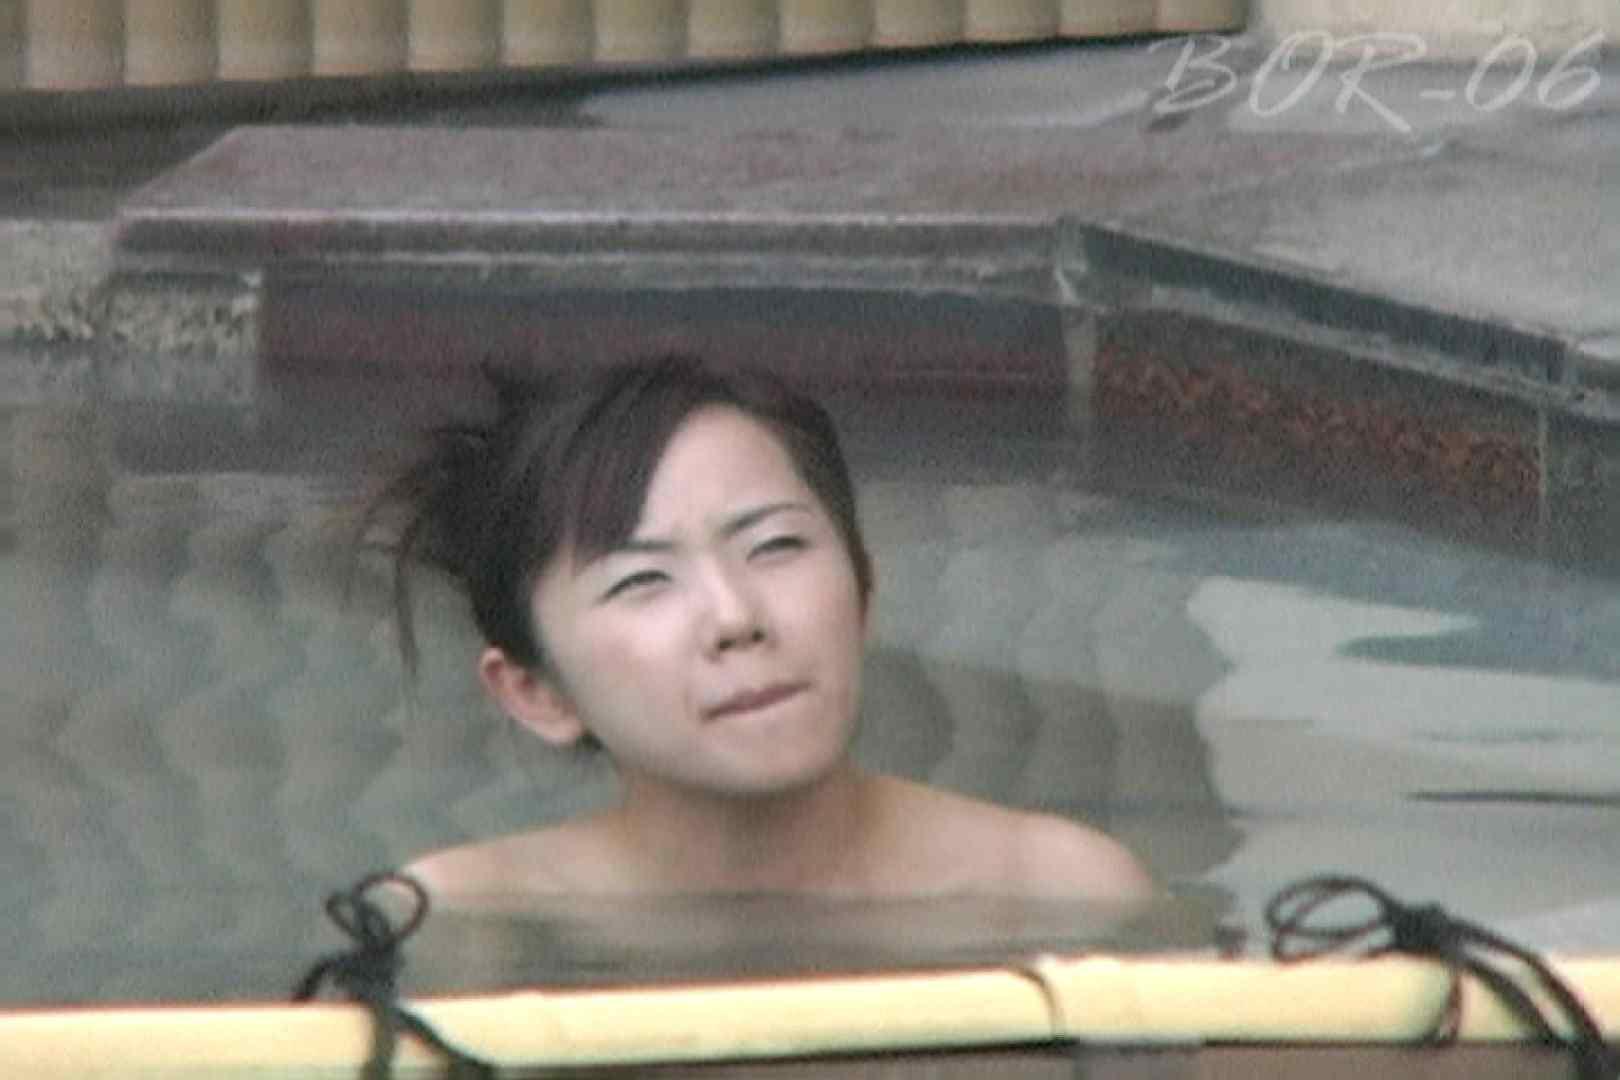 Aquaな露天風呂Vol.521 露天 おめこ無修正動画無料 92画像 50